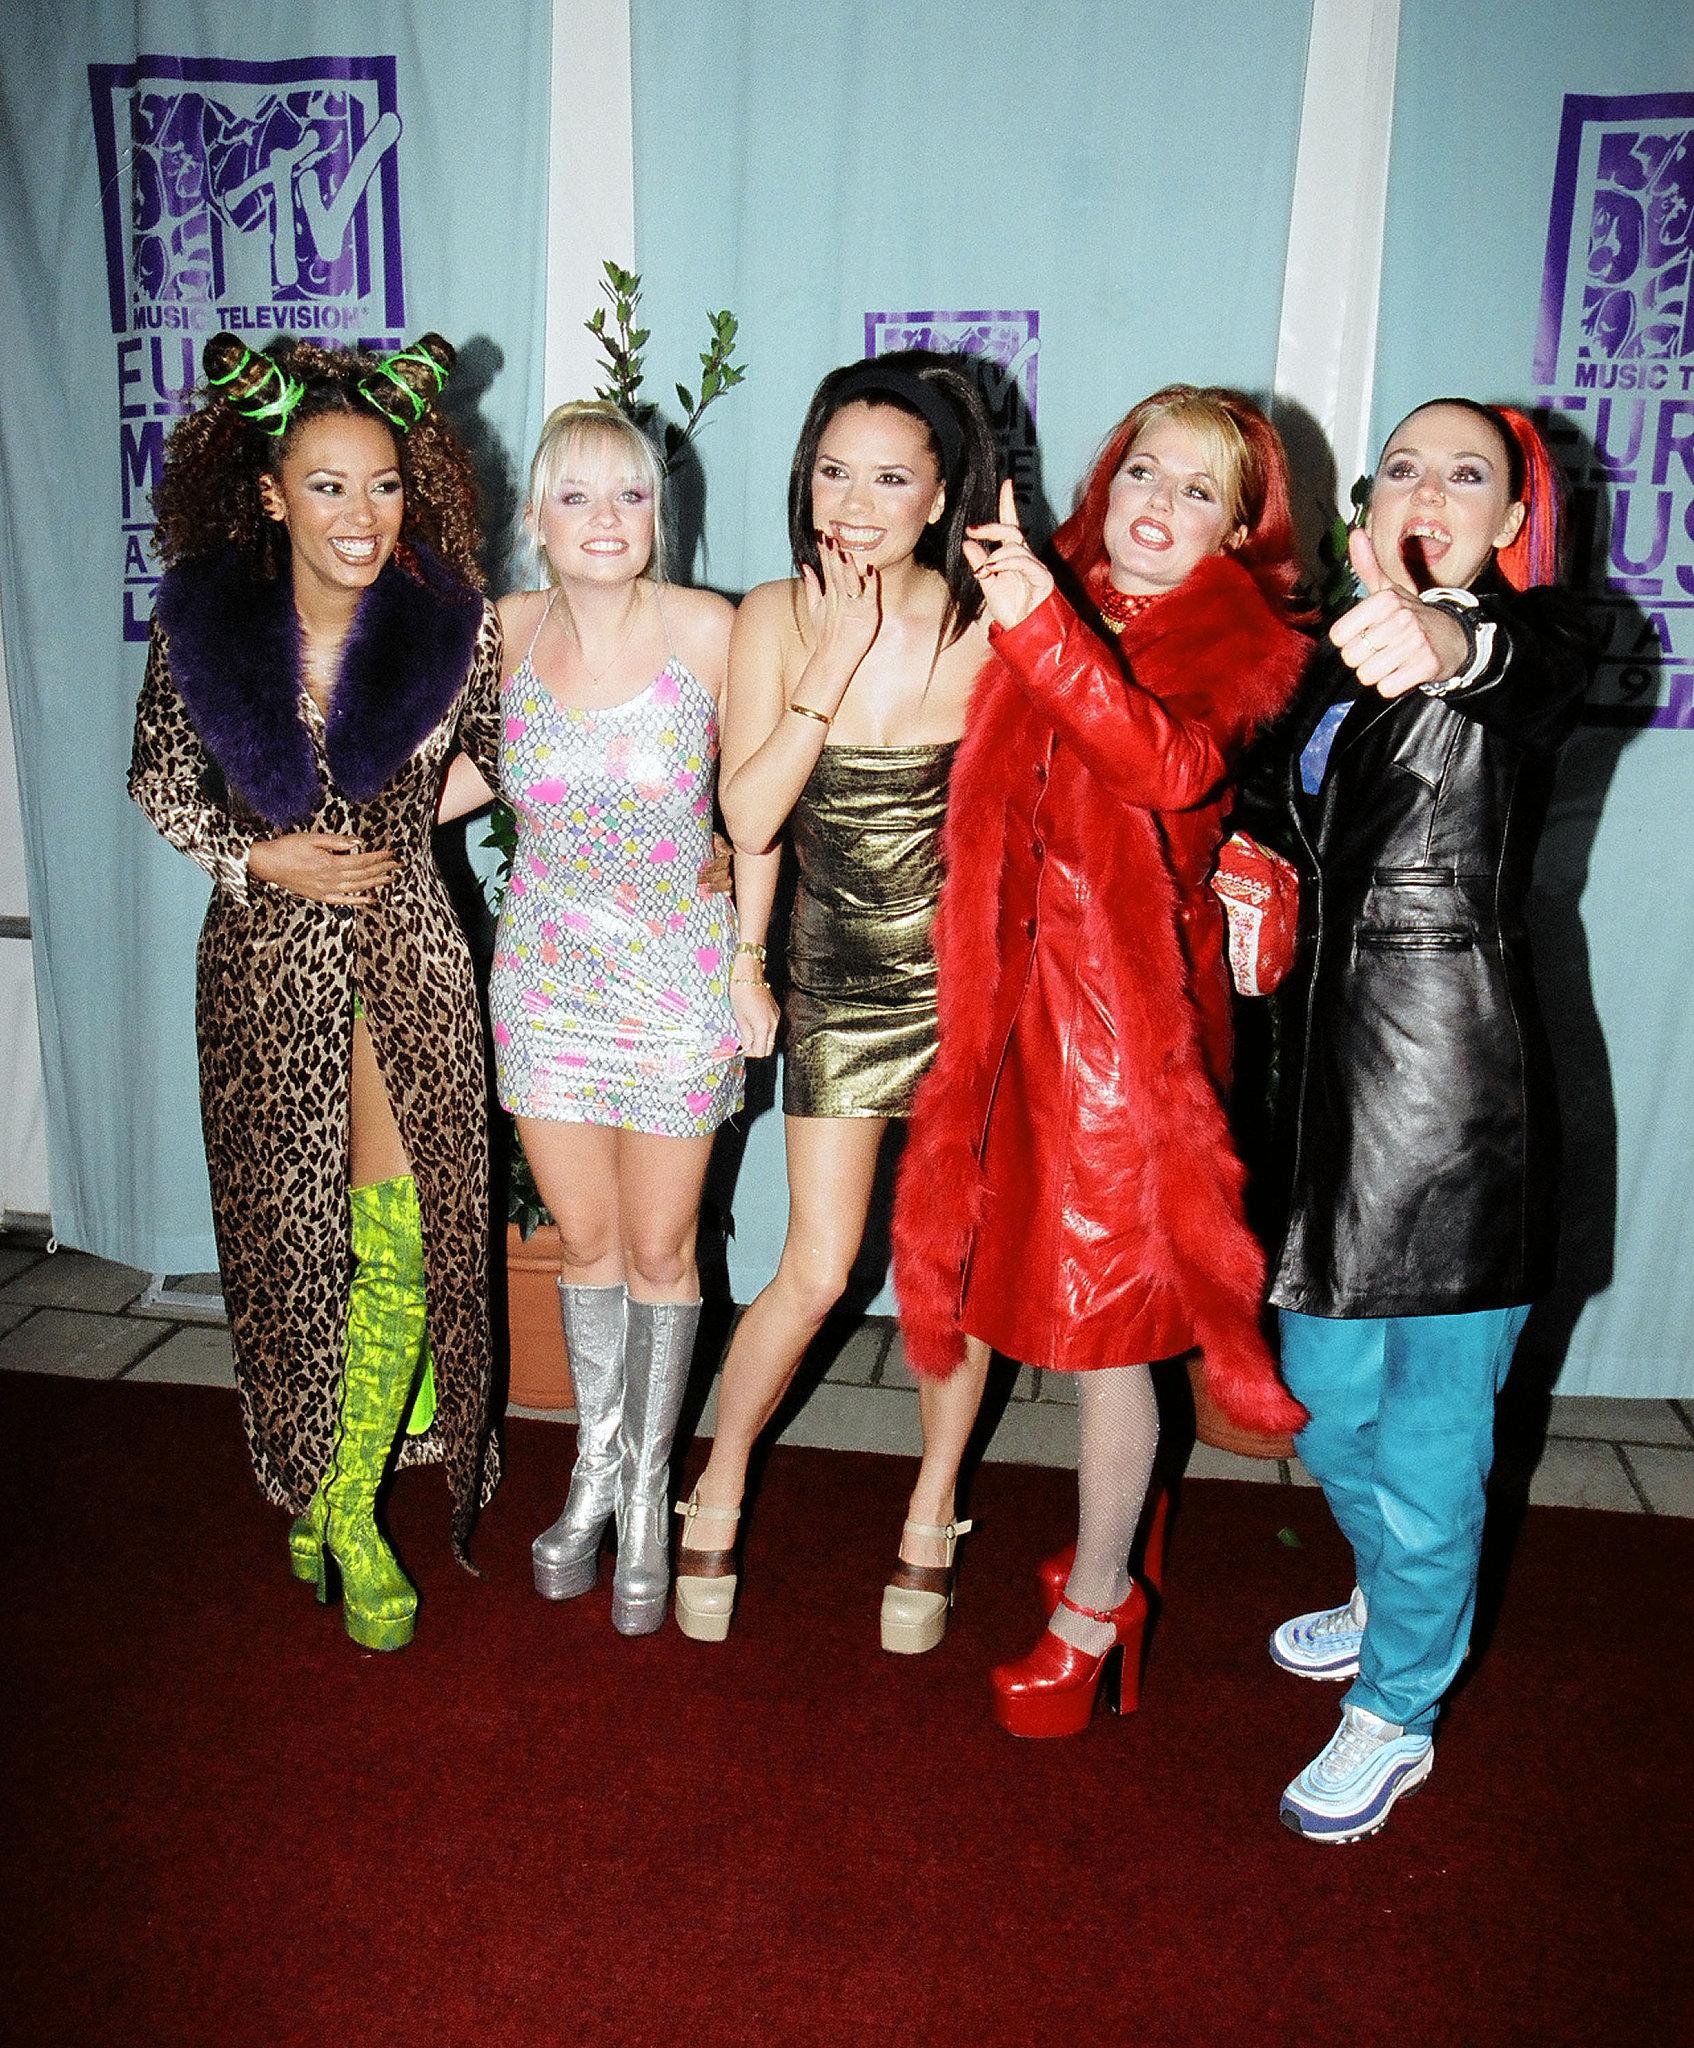 Victoria Beckham's Spice Girls Costumes